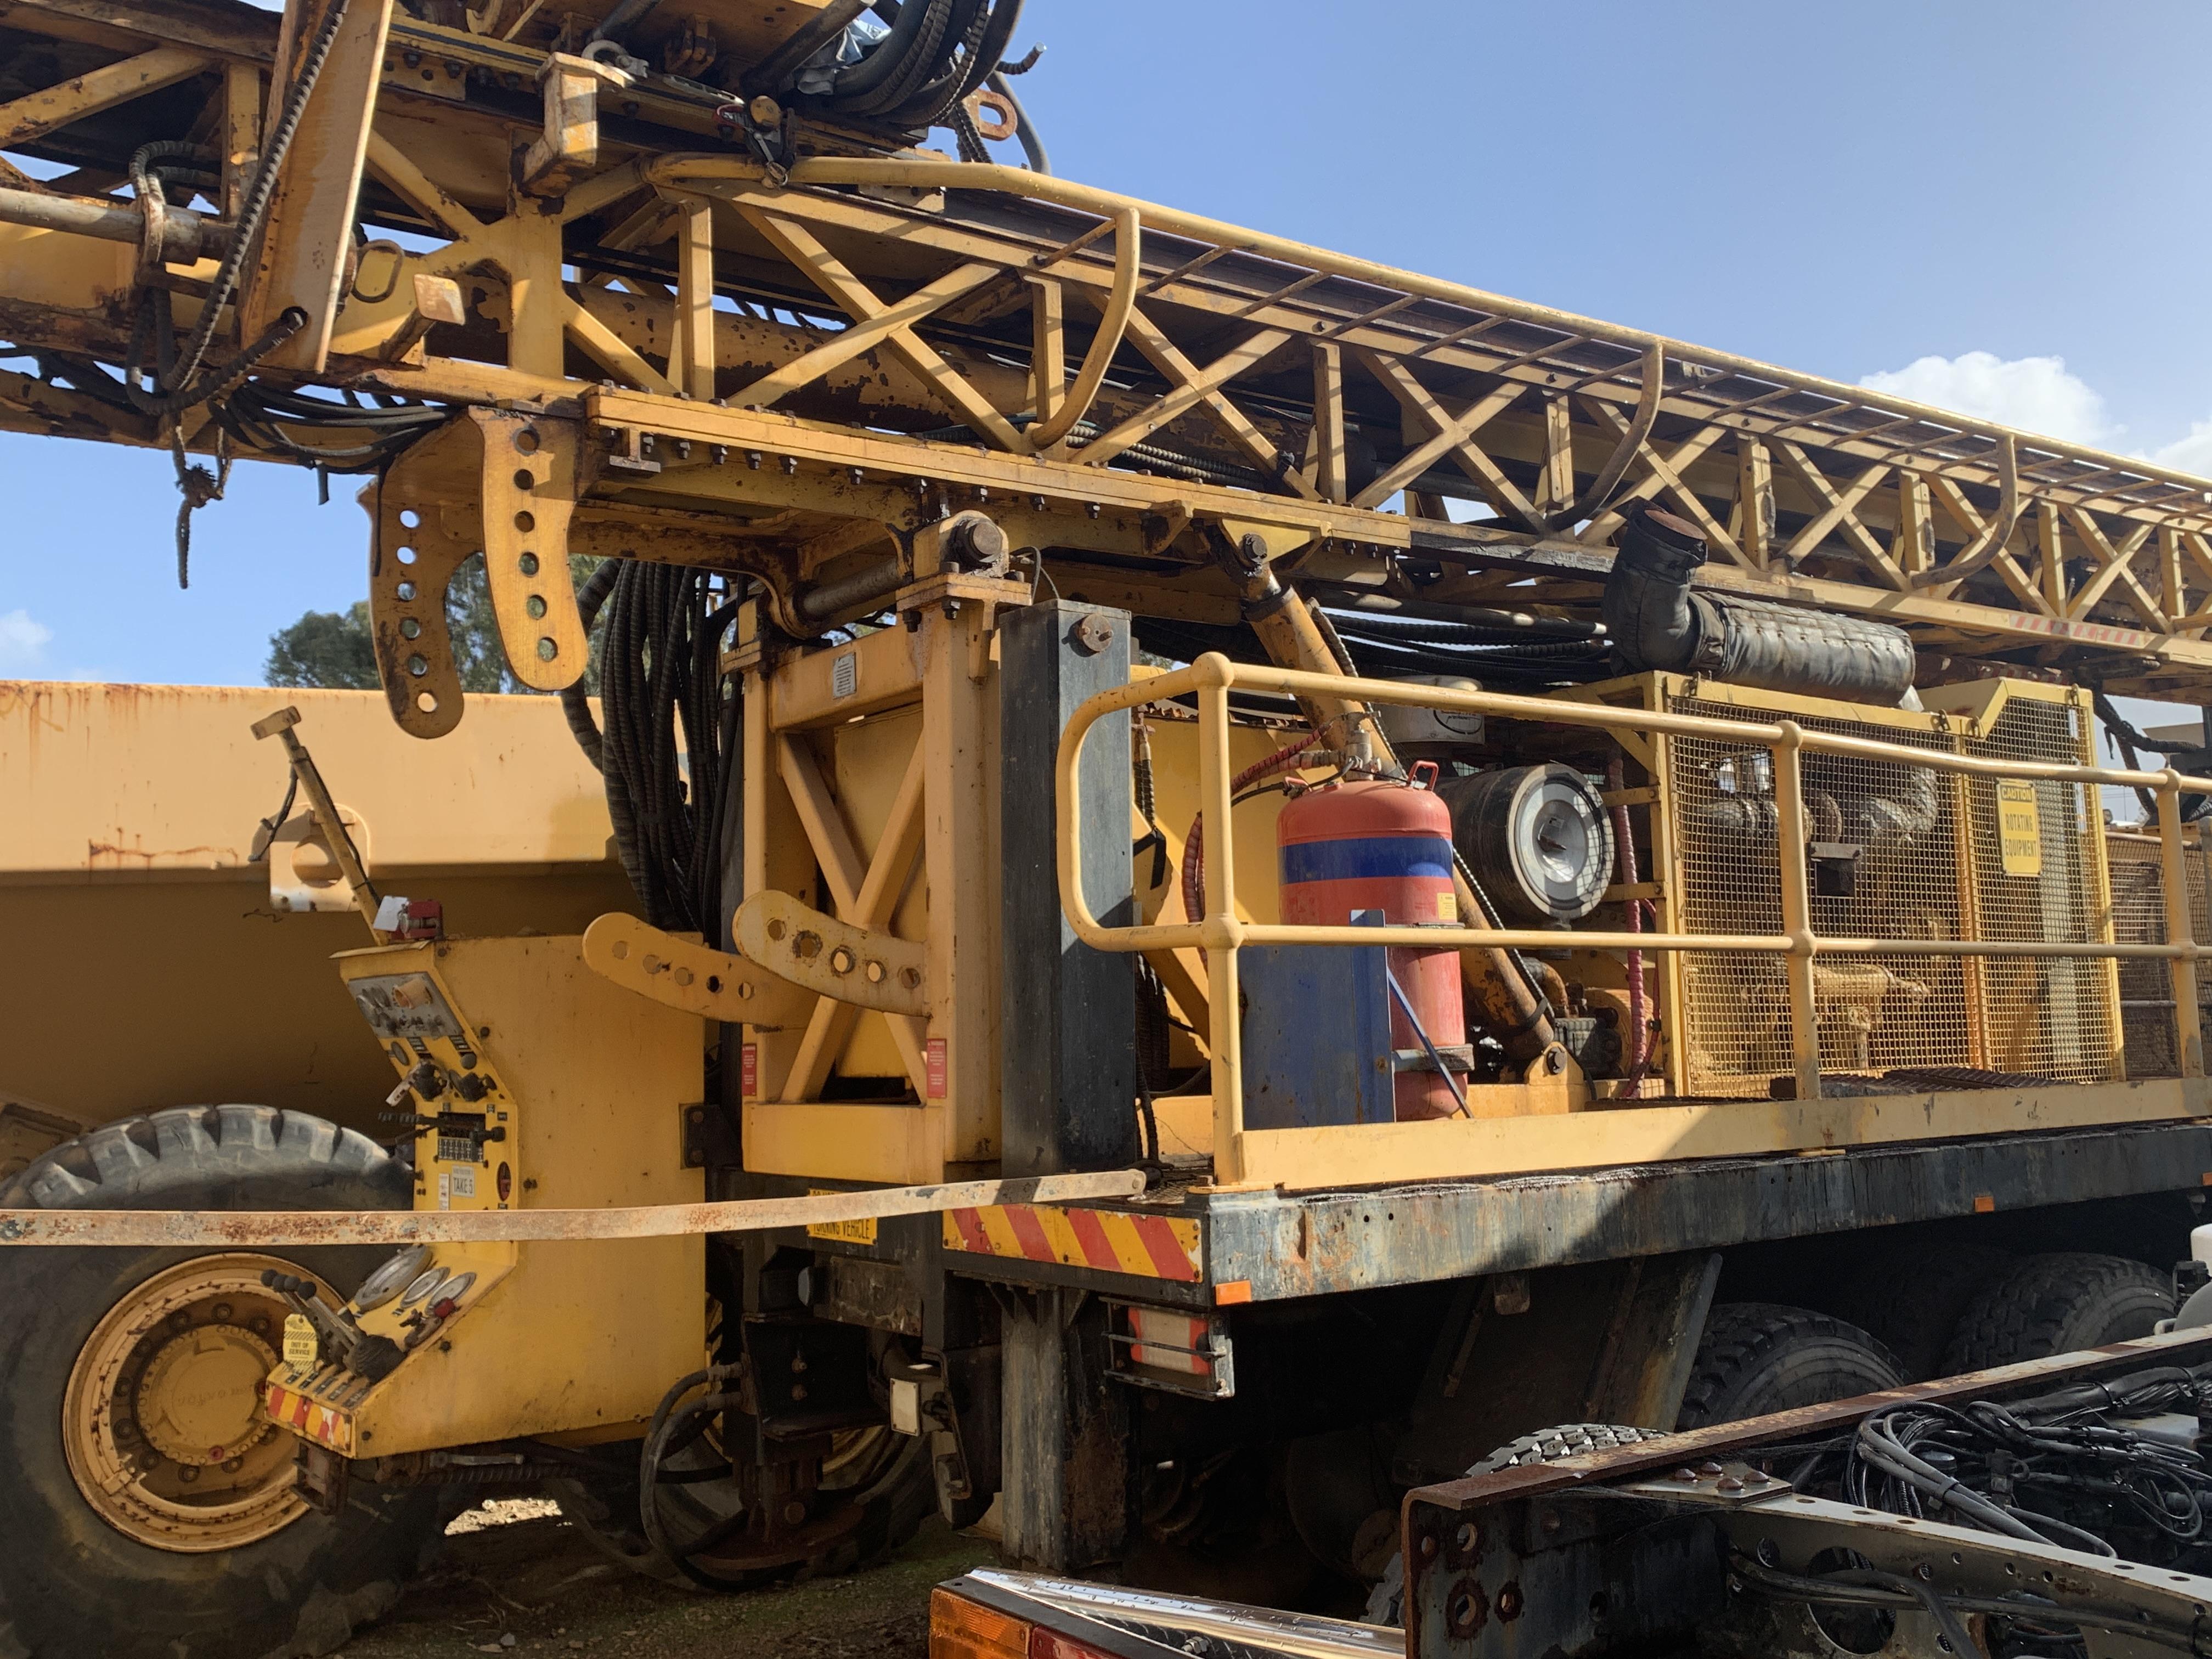 KL 1500 multi purpose deep hole drill rig